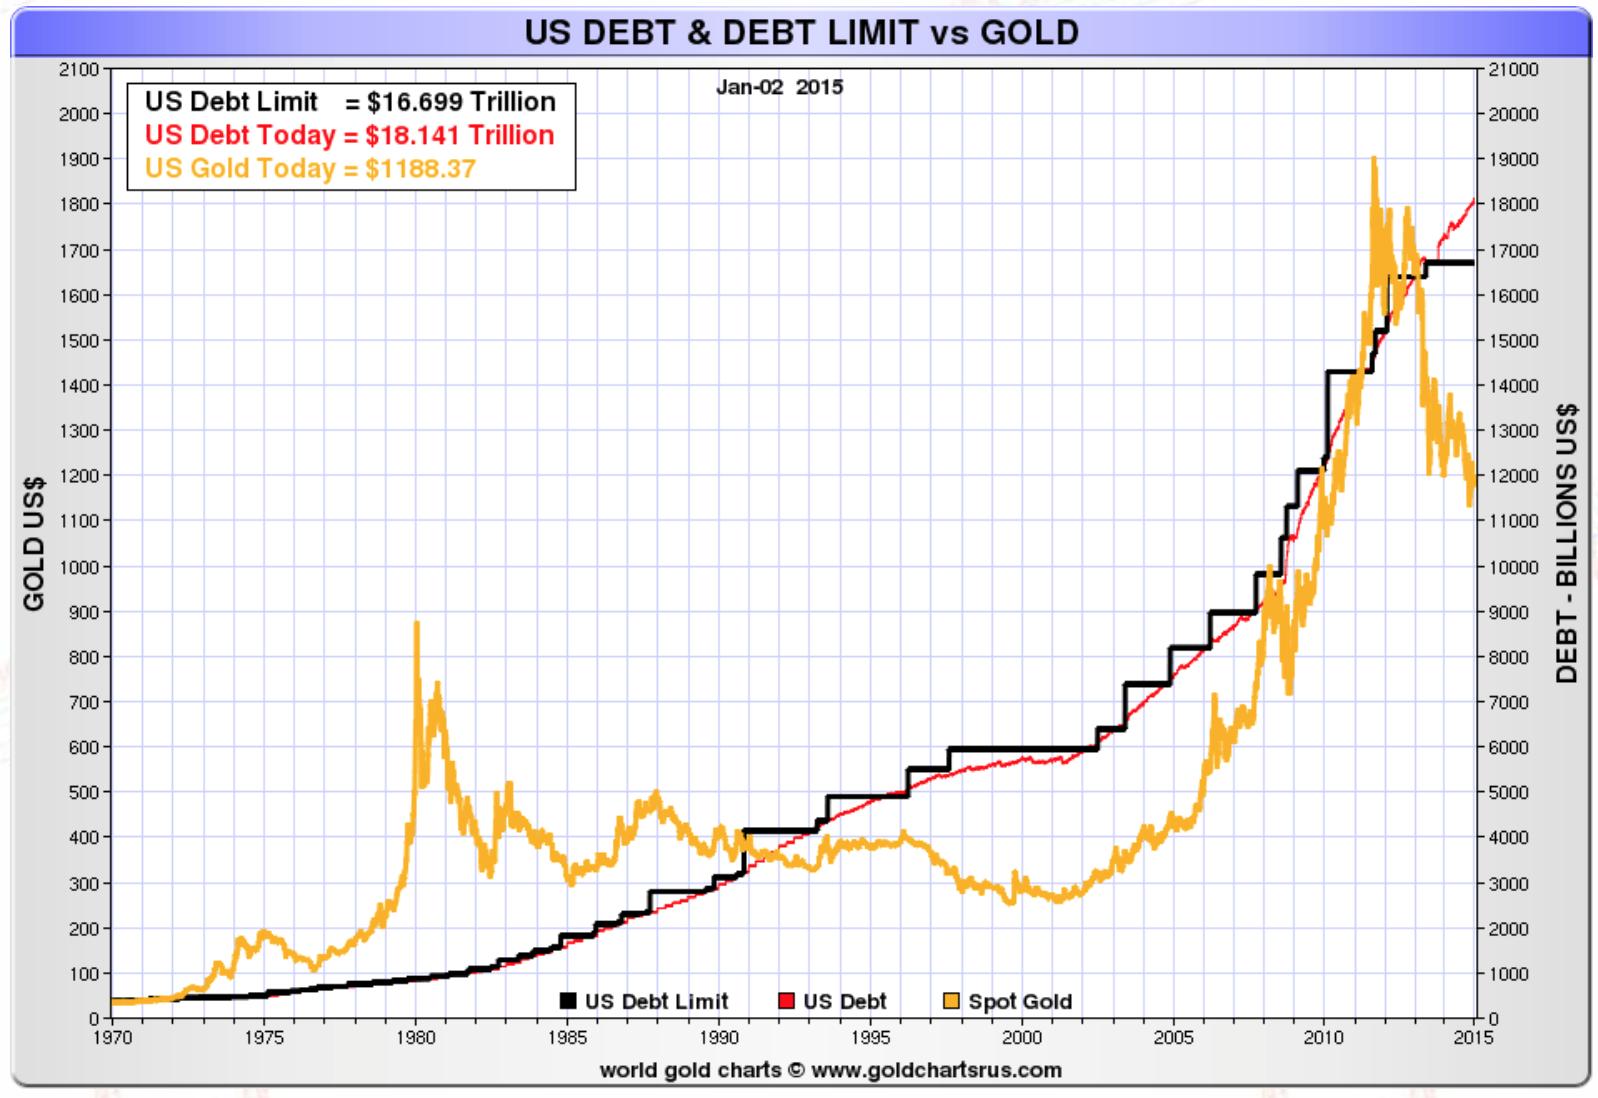 US Debt Limit vs Gold